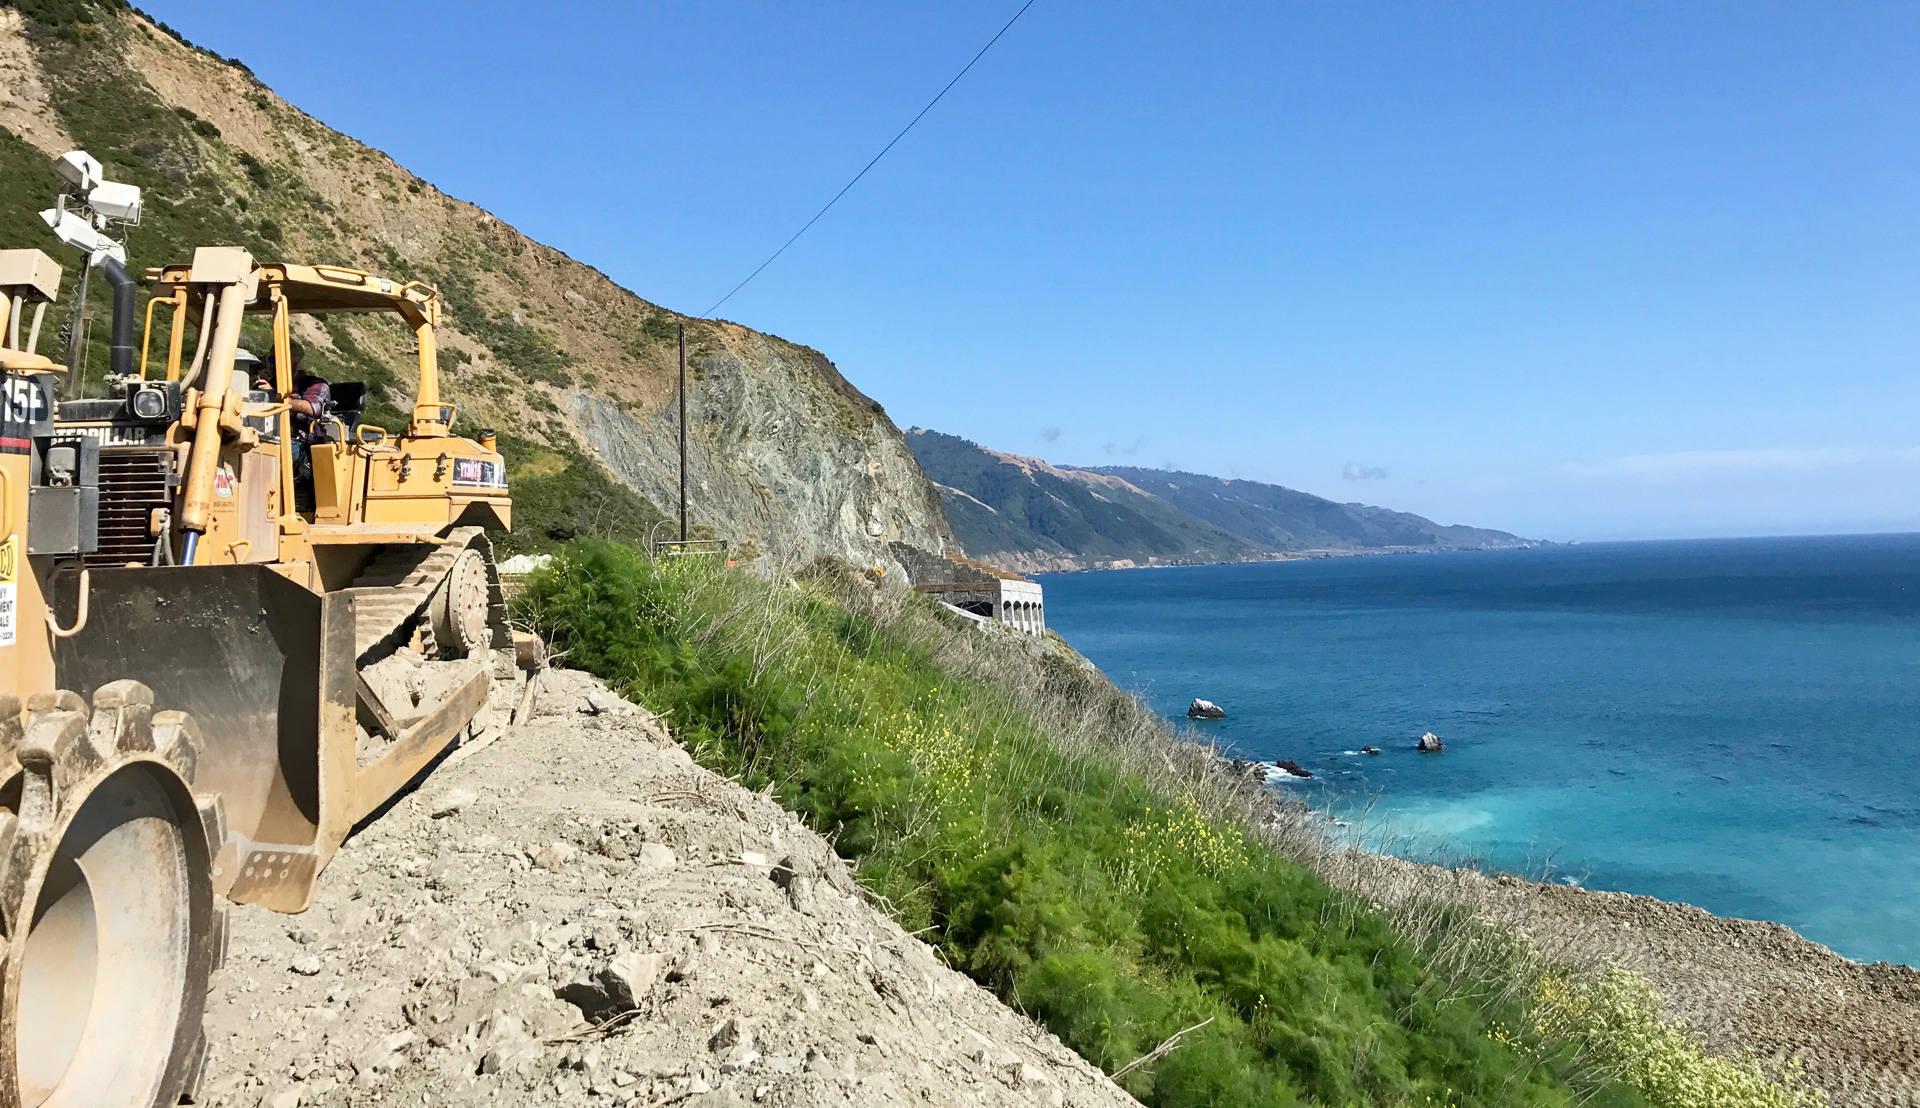 Heavy equipment sits near Paul's Slide on Highway 1. John Sepulvado/KQED